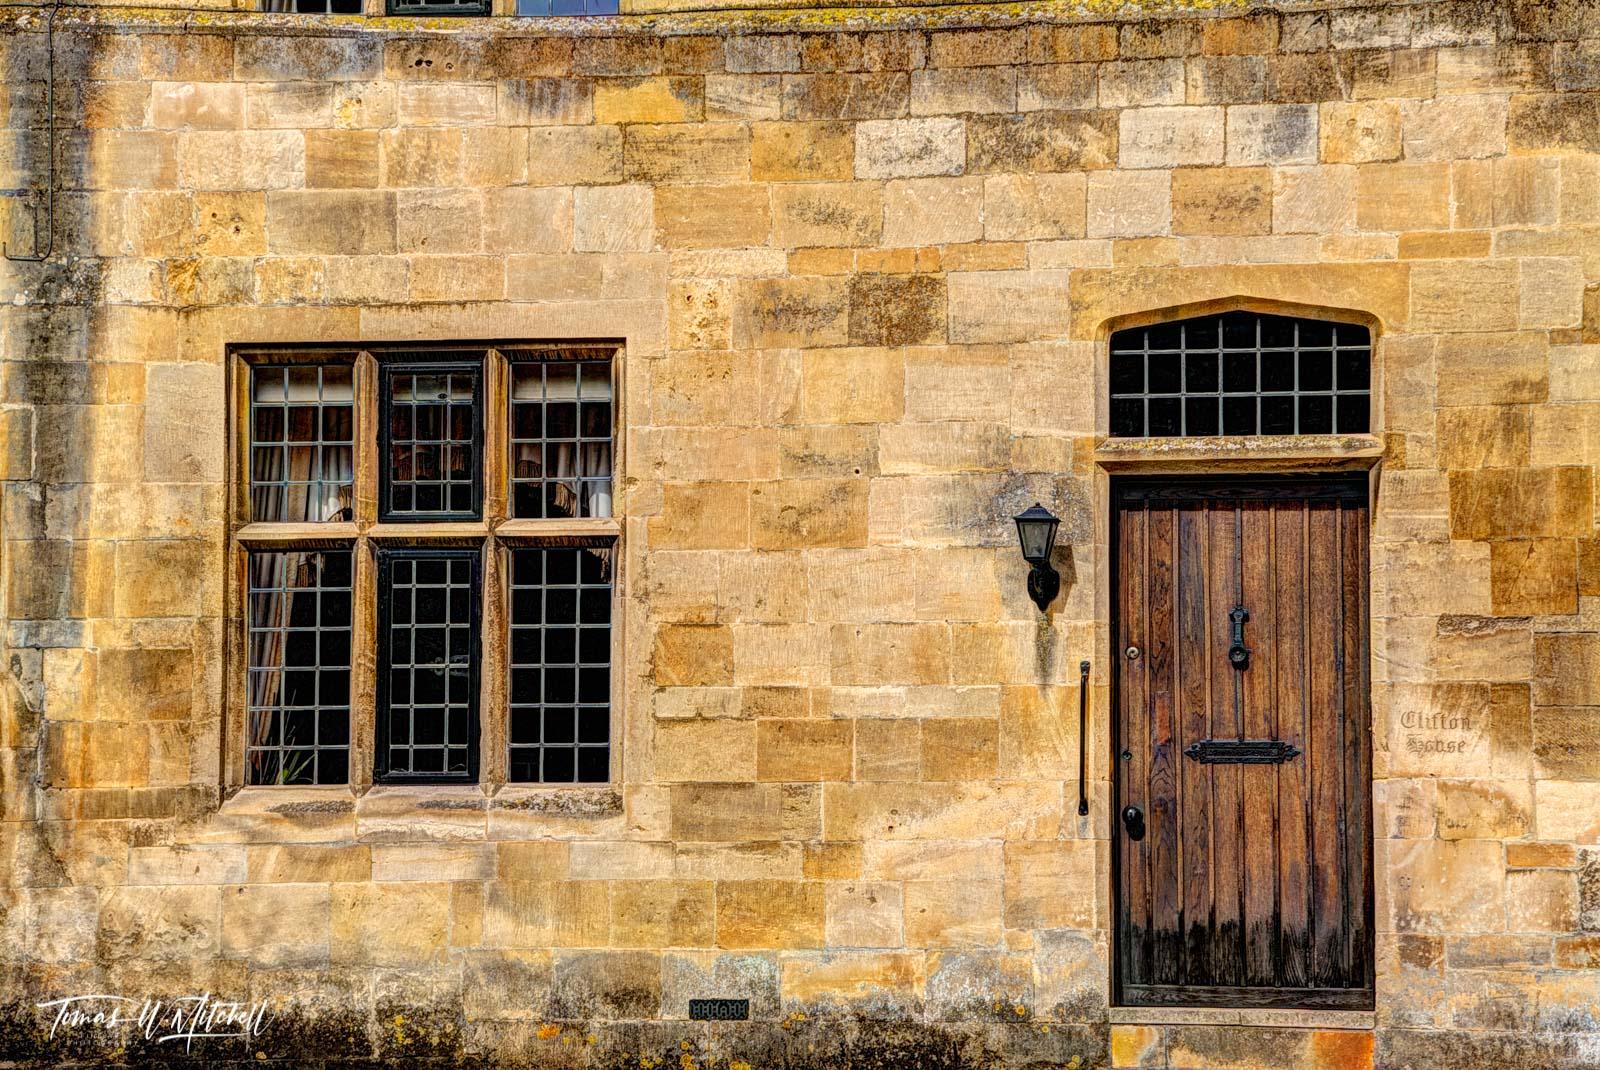 limited edition, museum grade, fine art, prints, photograph, house, cotswolds, england, door, windows, villages, photo